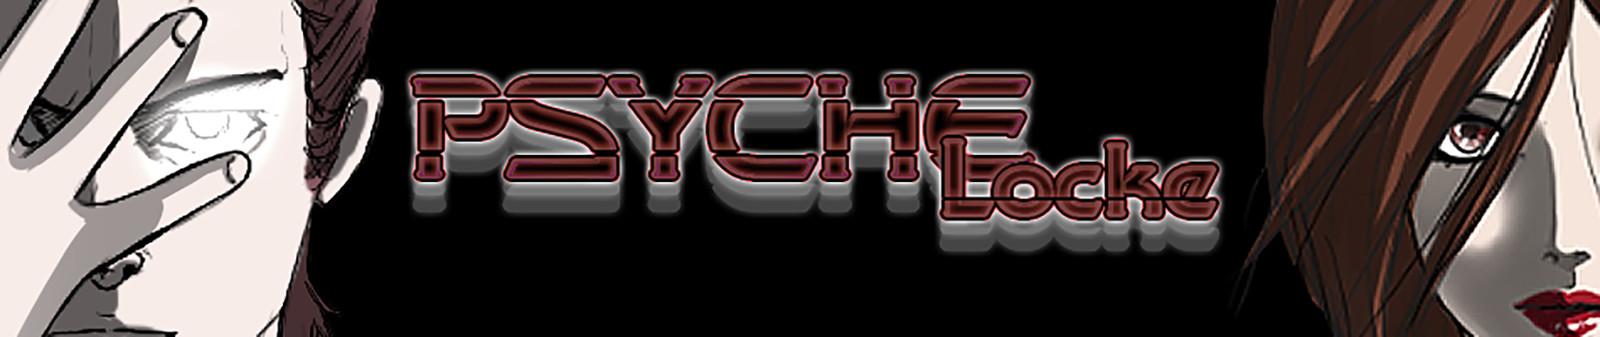 PSYCHE Locke - Banner